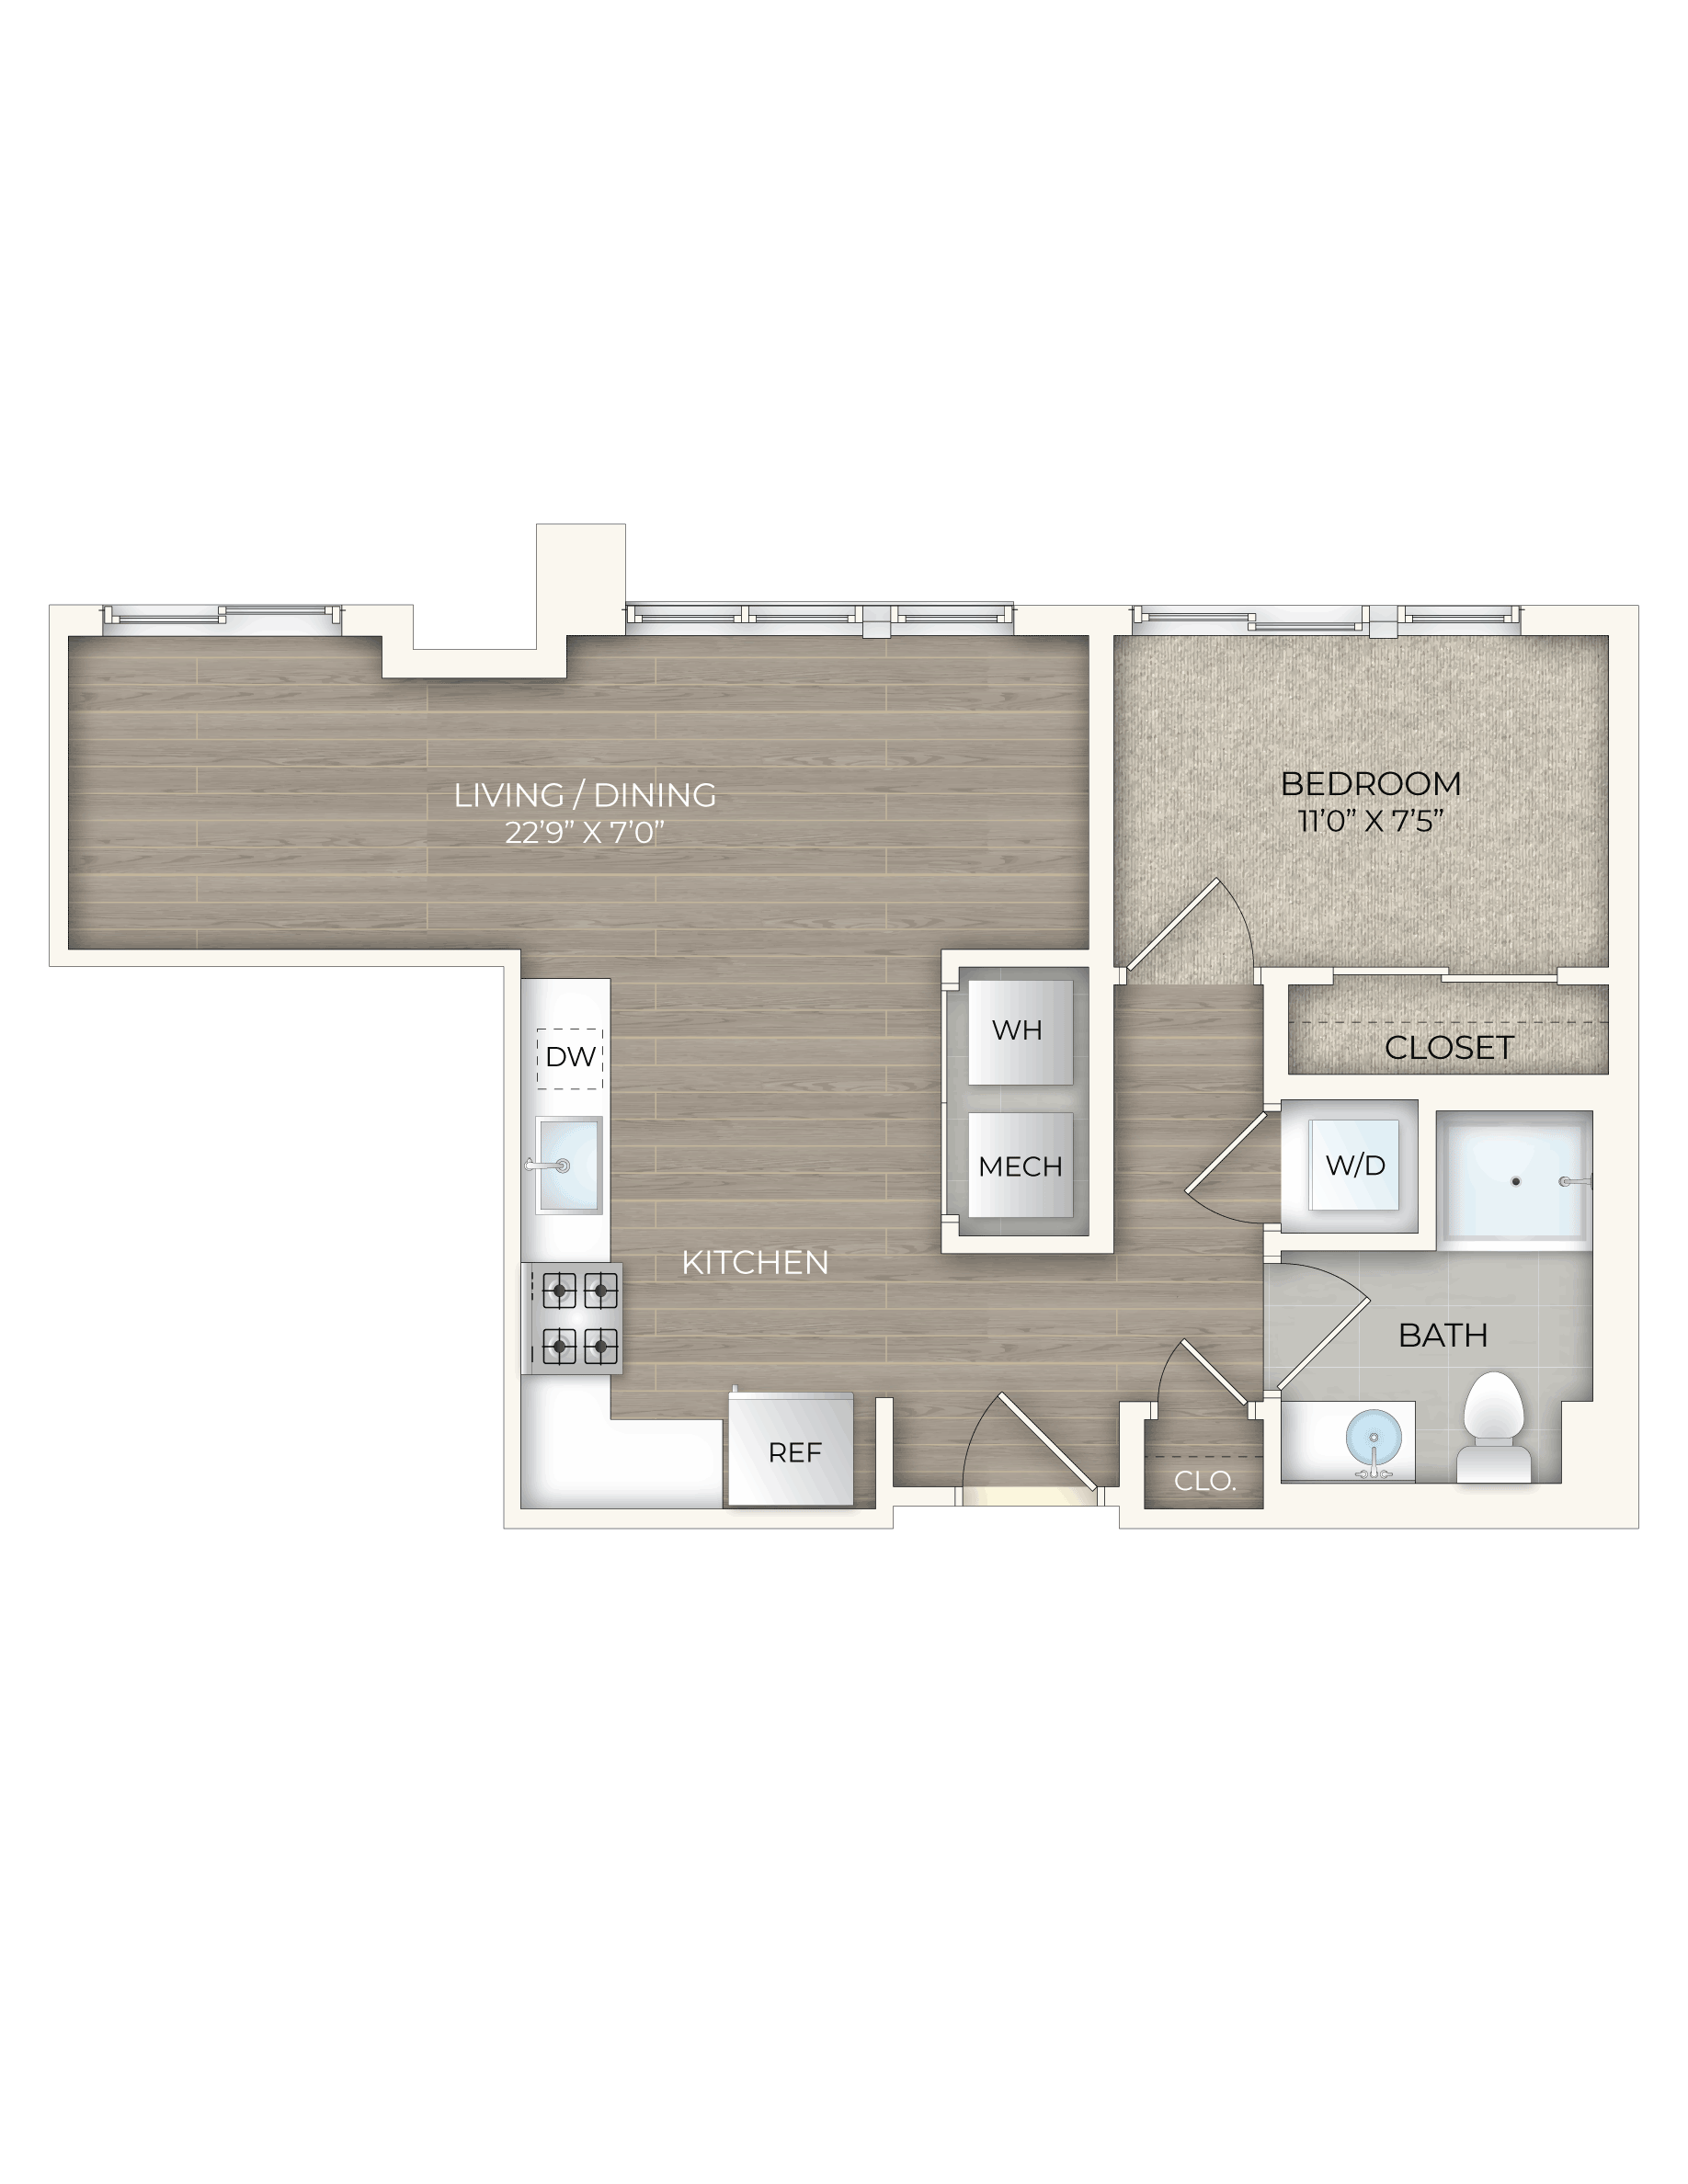 floor plan image of apartment 231S